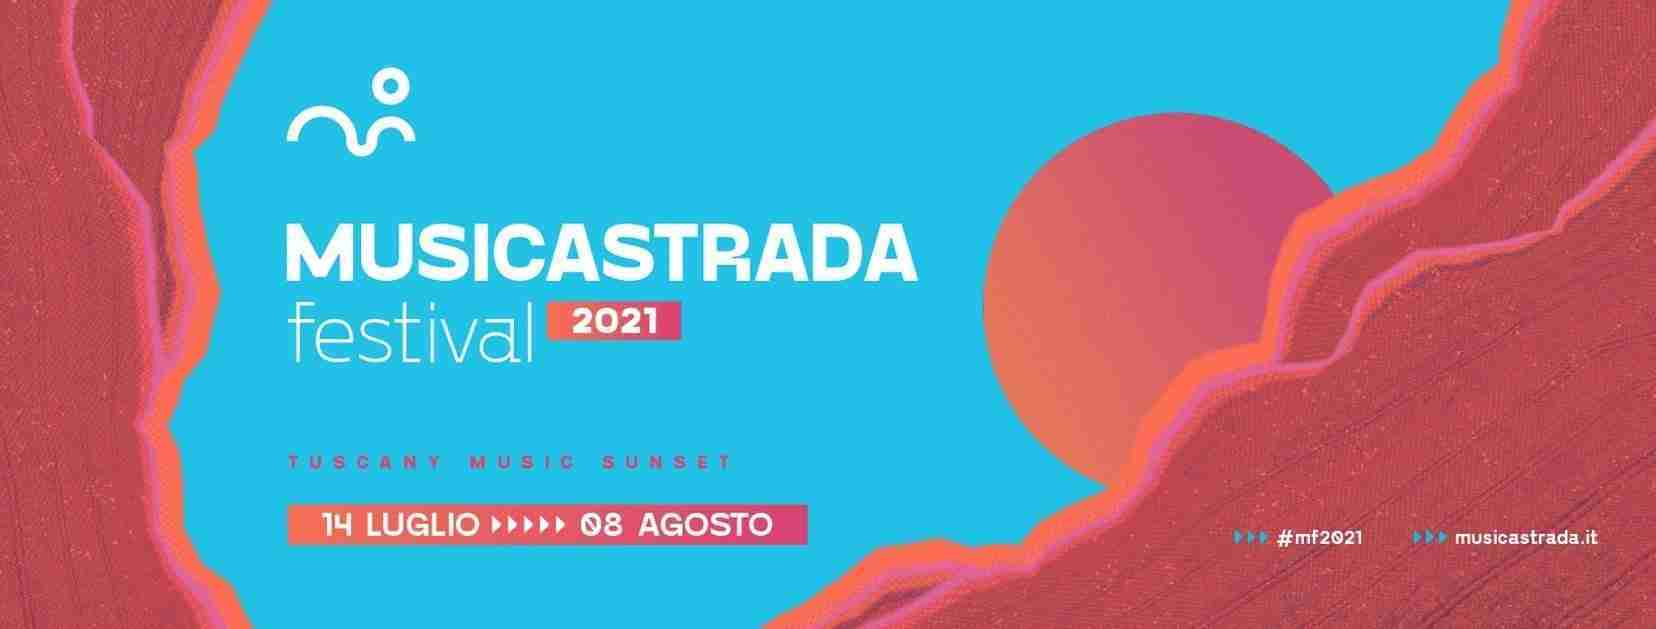 Musicastrada 2021